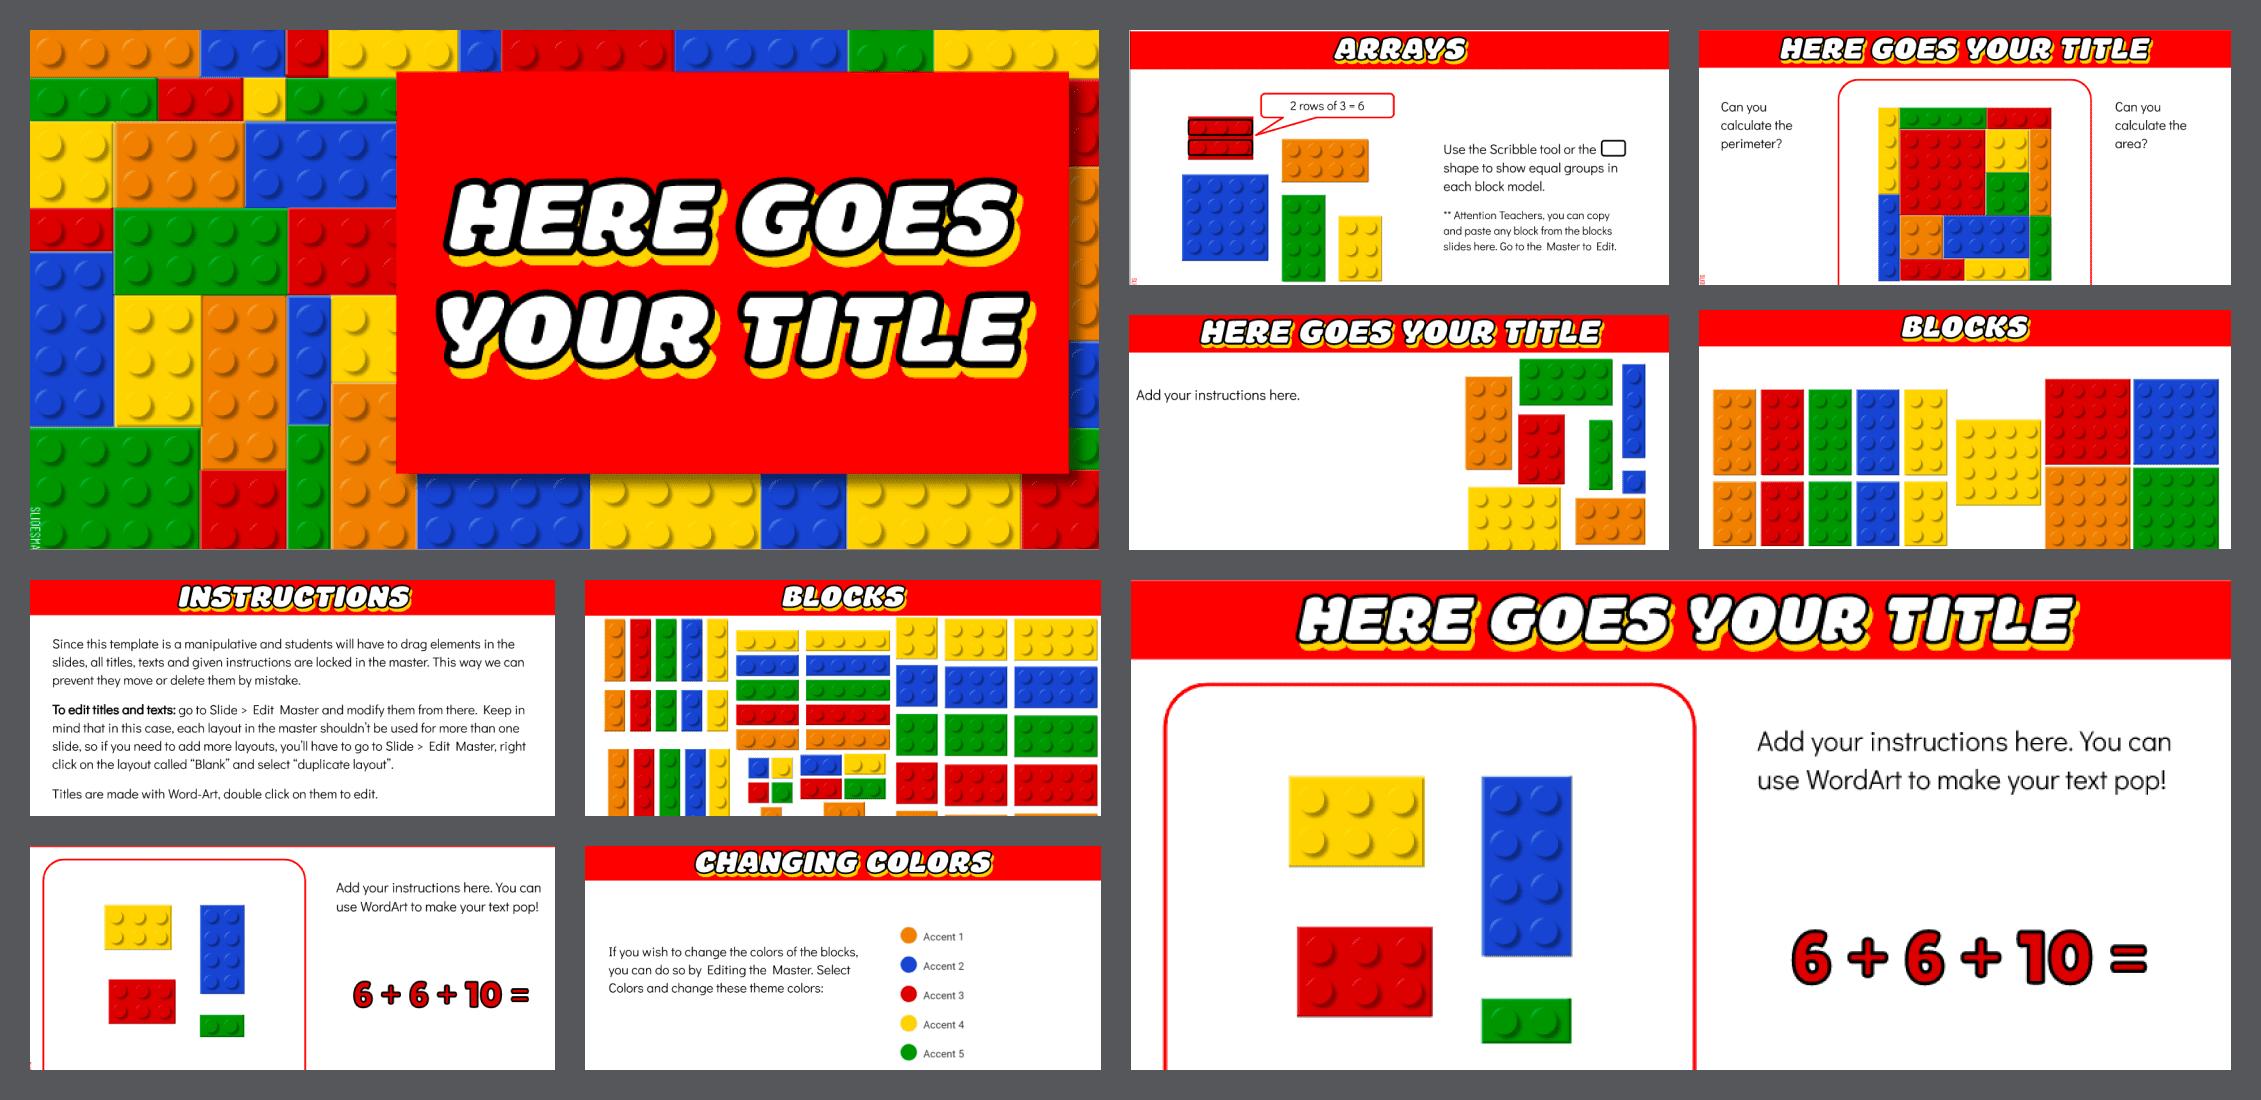 50+ Free and Premium Simple Google Slides Themes in 2021 - simple google slides theme 49